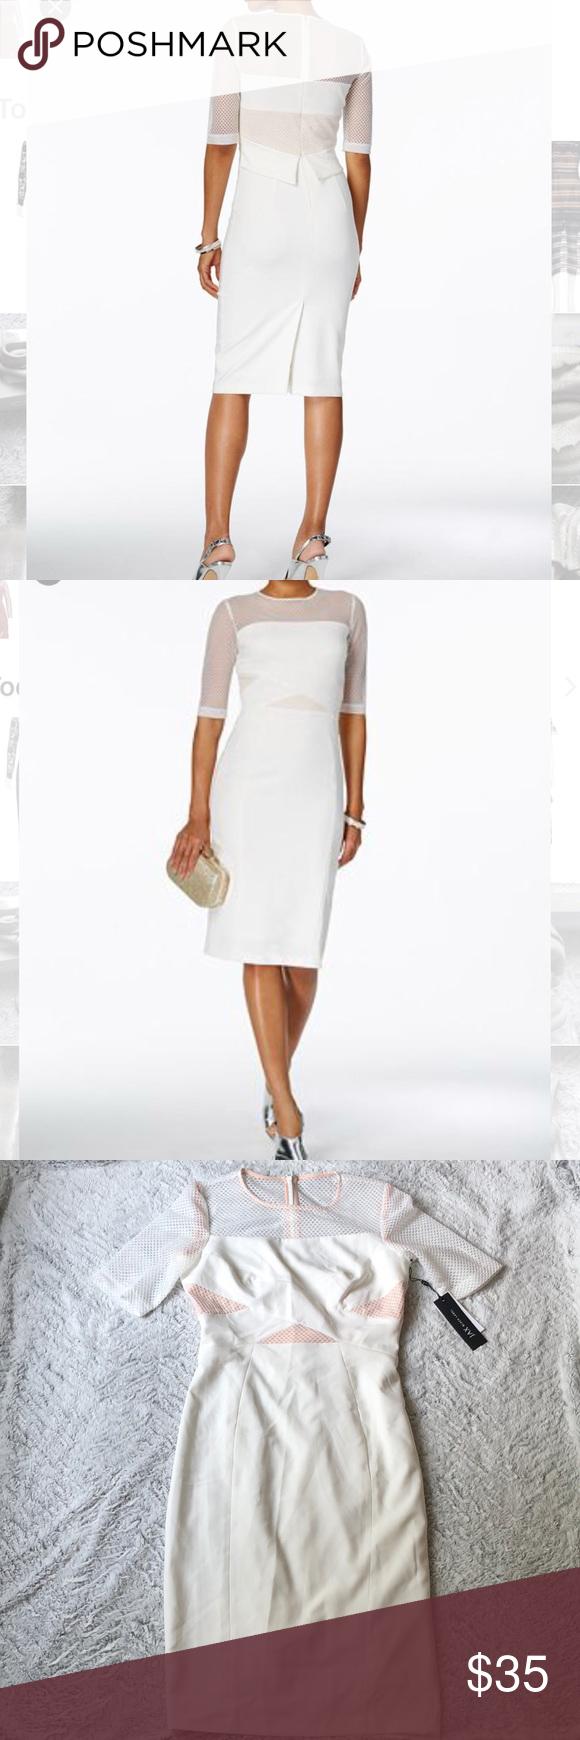 0cba9728c0 NWT jax black label sheath mesh pencil dress sz 6 New with tags Jax black  label ivory pencil white mesh illusion sheath dress. Size 6. Short sleeve.